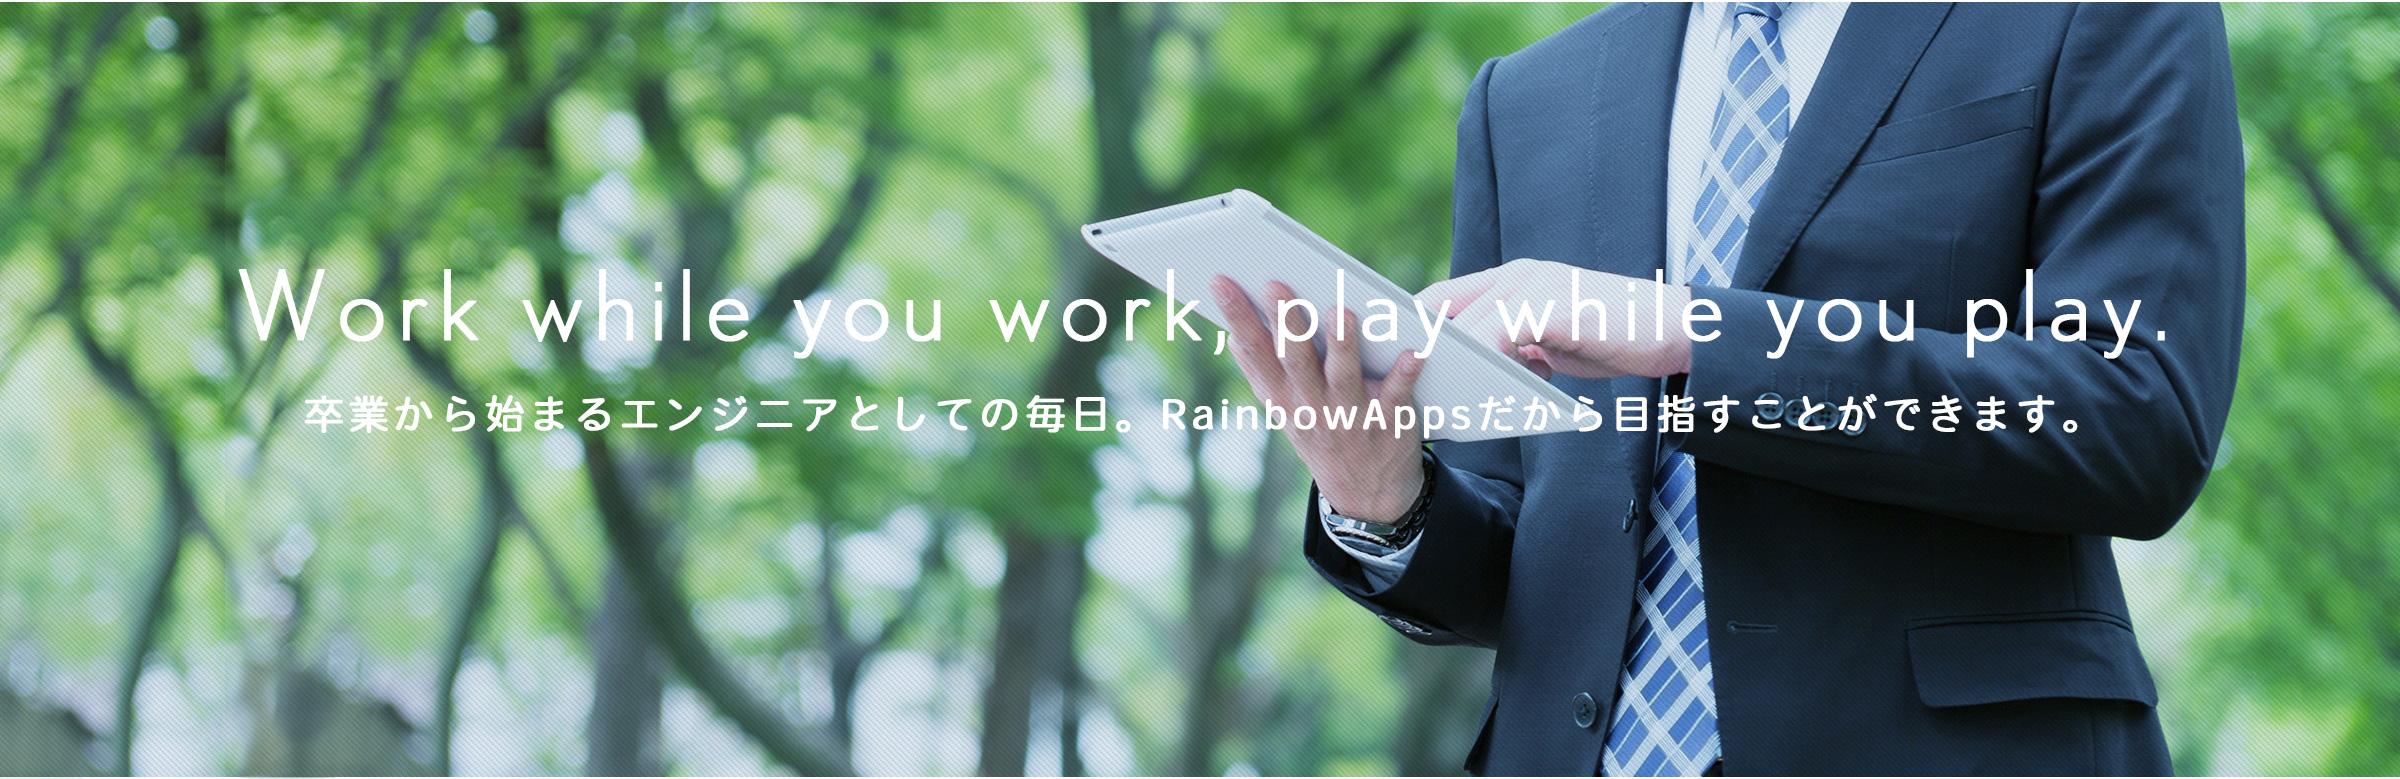 Work while you work, play while you play. 卒業から始まるエンジニアとしての毎日。RainbowAppsだから目指すことができ ます。